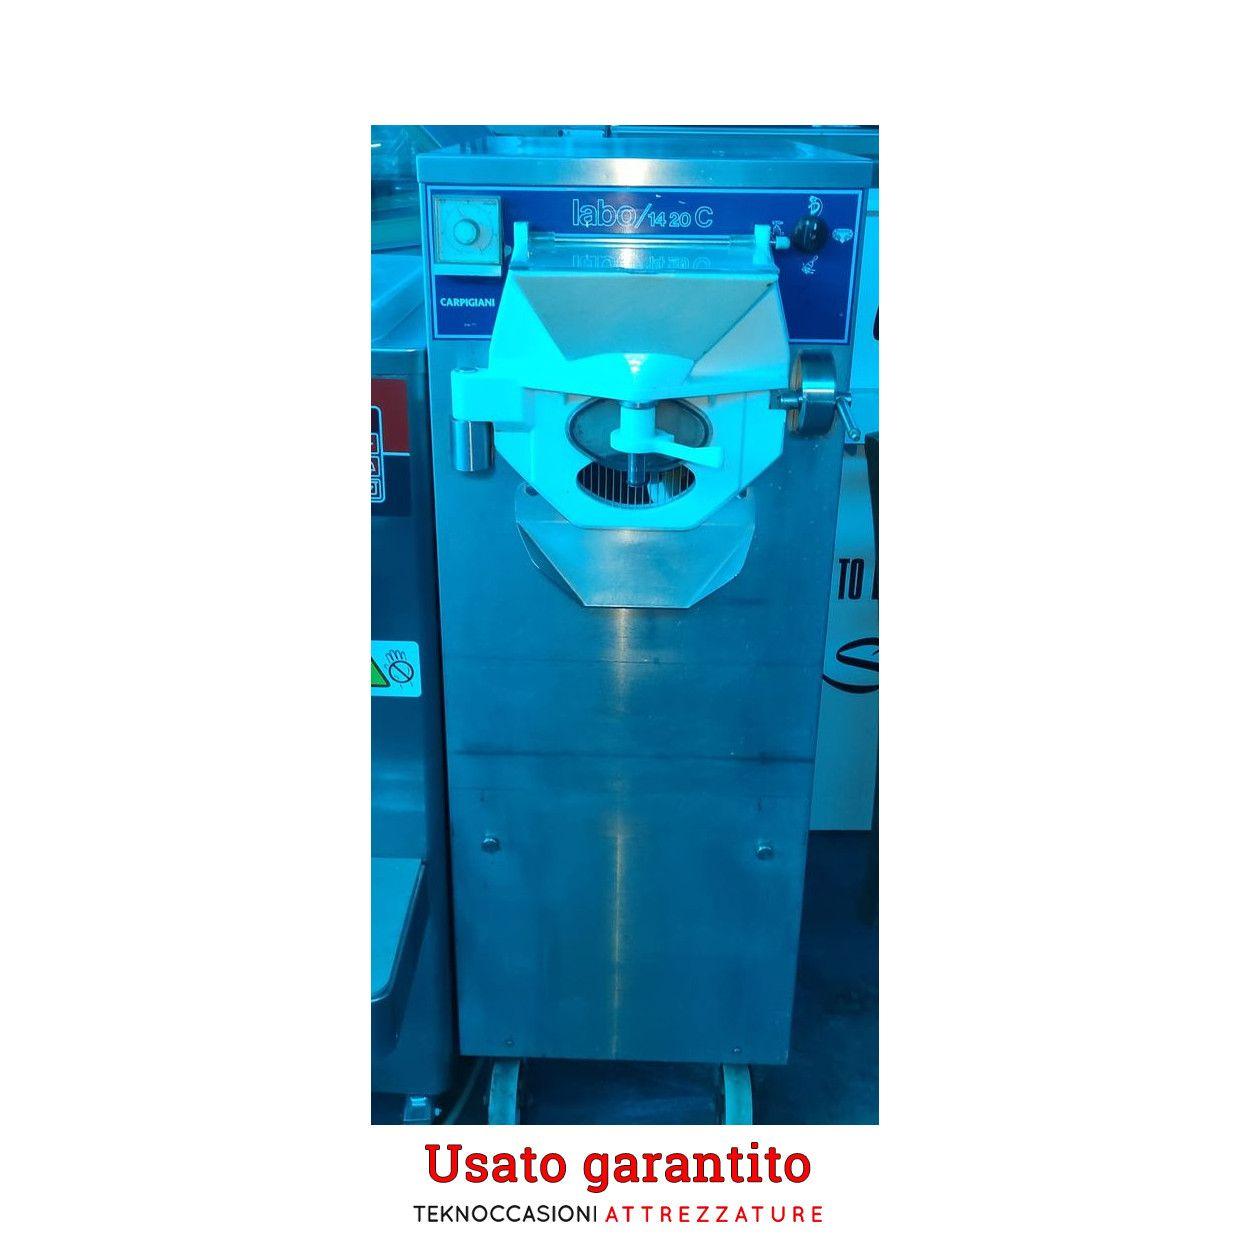 Mantecatore Carpigiani Labo14/20 C ad acqua